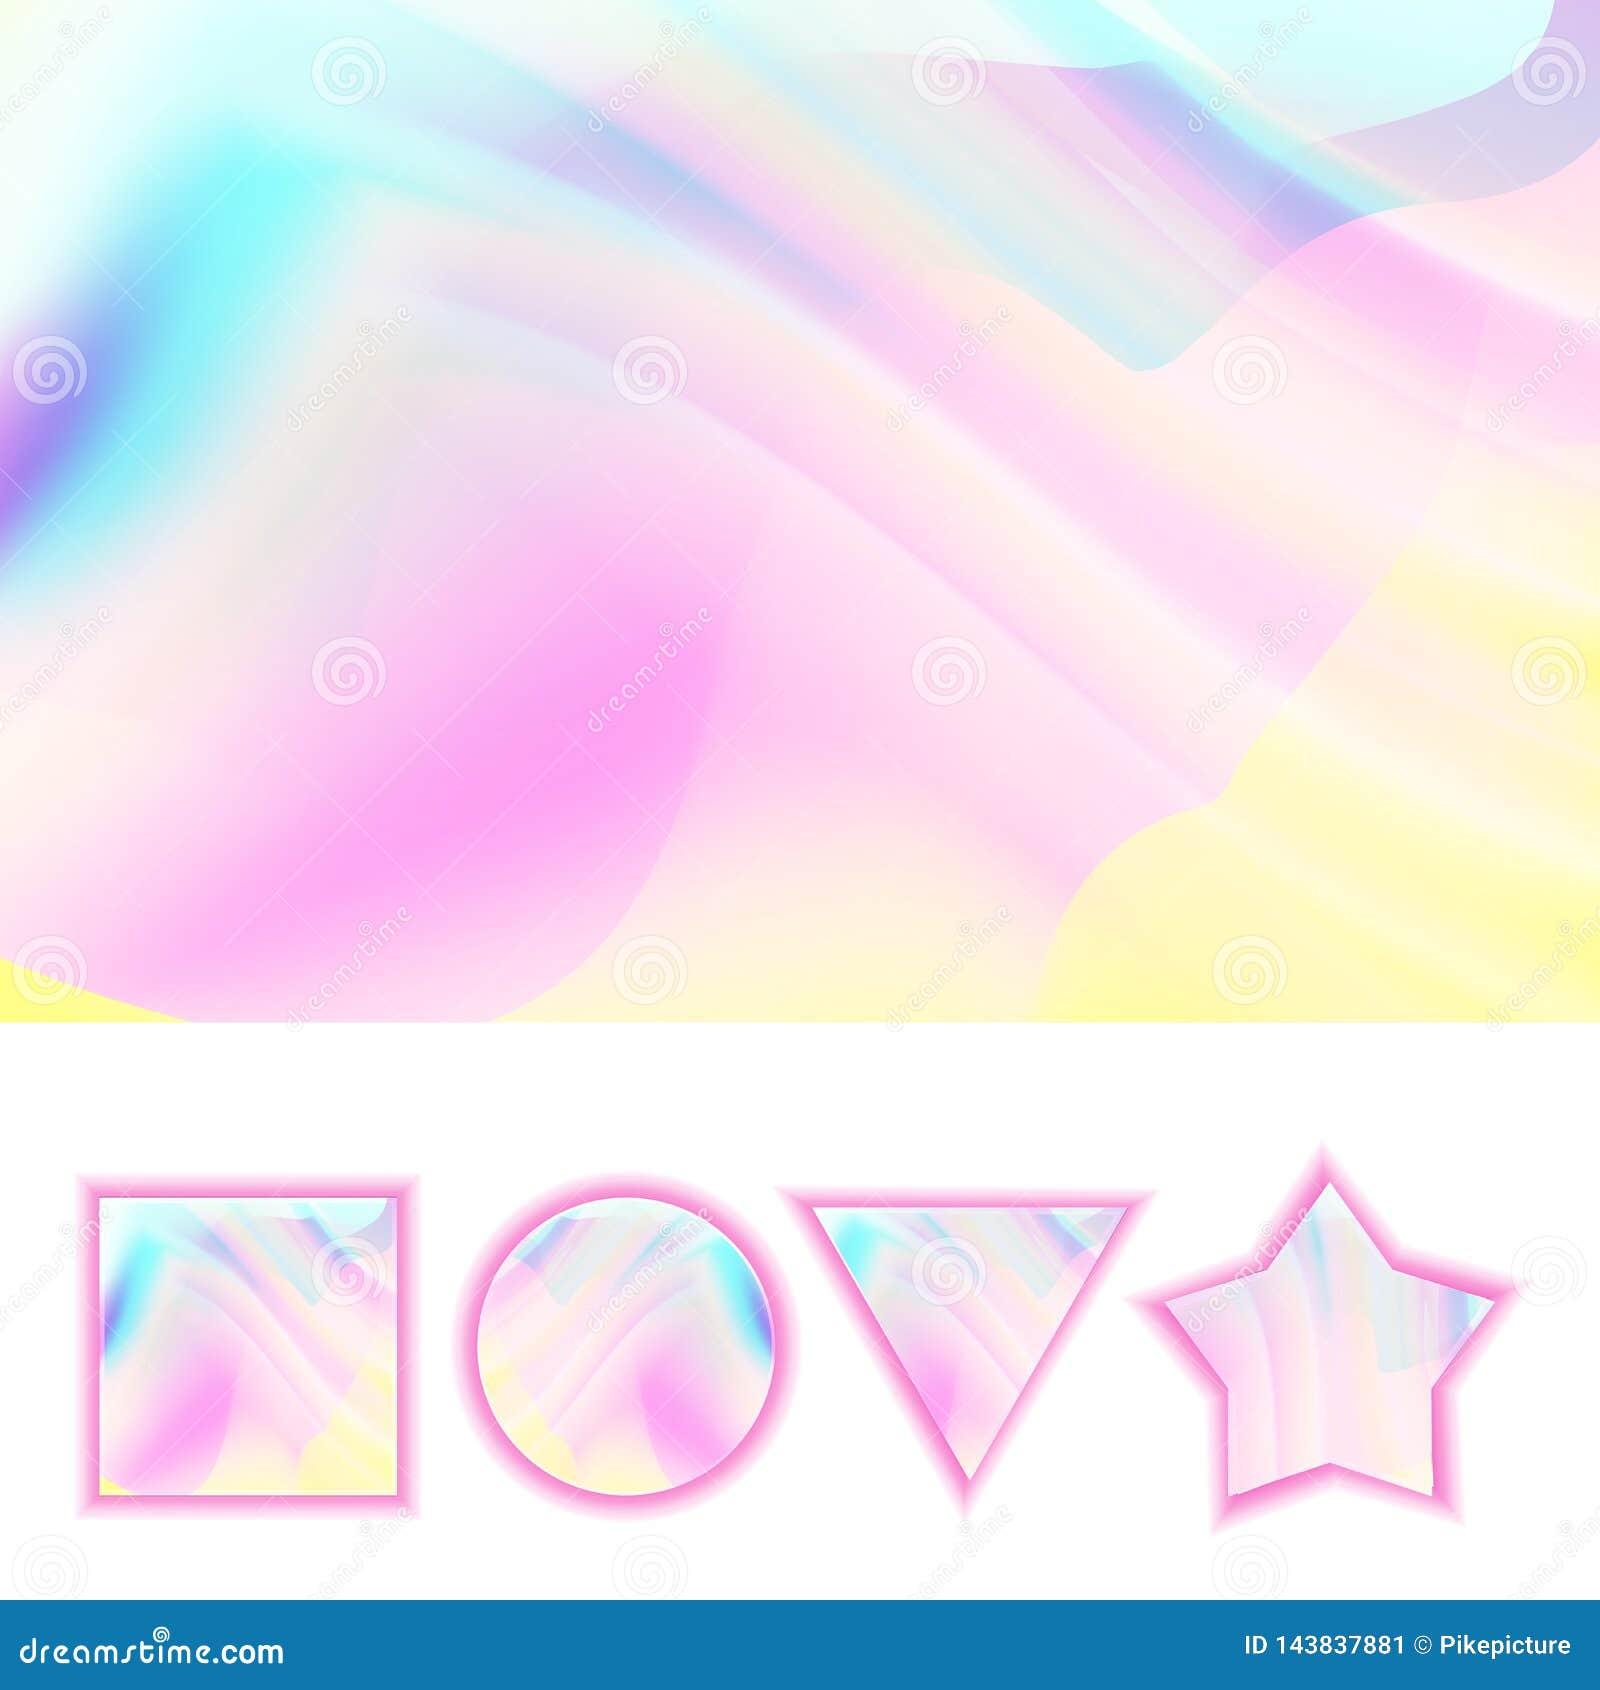 Girlie Background Vector. Abstract Holographic Pastel Girlie Backdrop. Rainbow Soft Color. Illustration